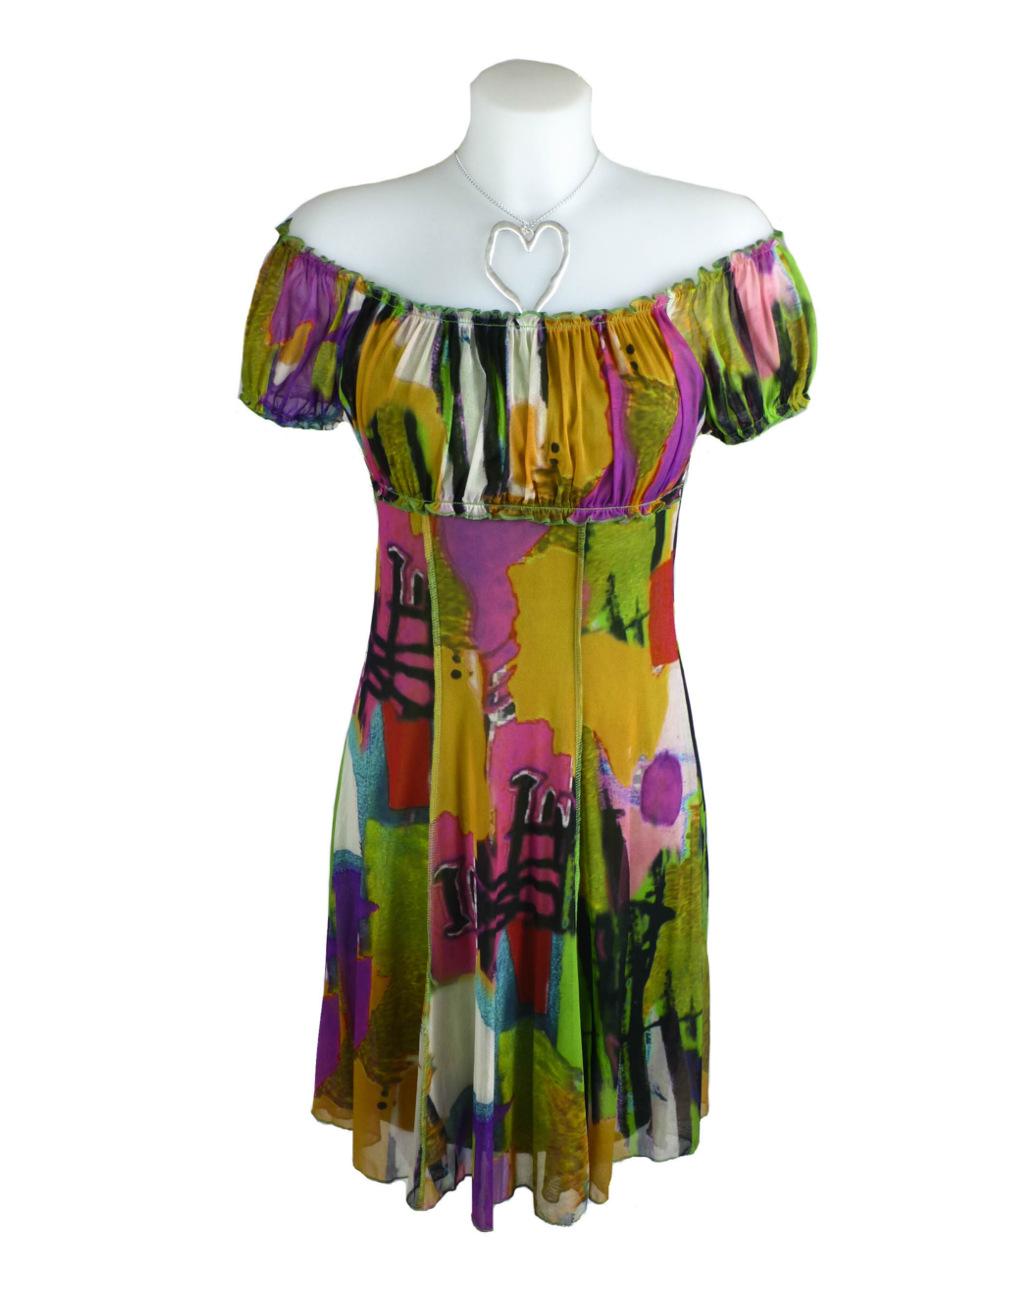 Lulu H French Style Green Summer Dress